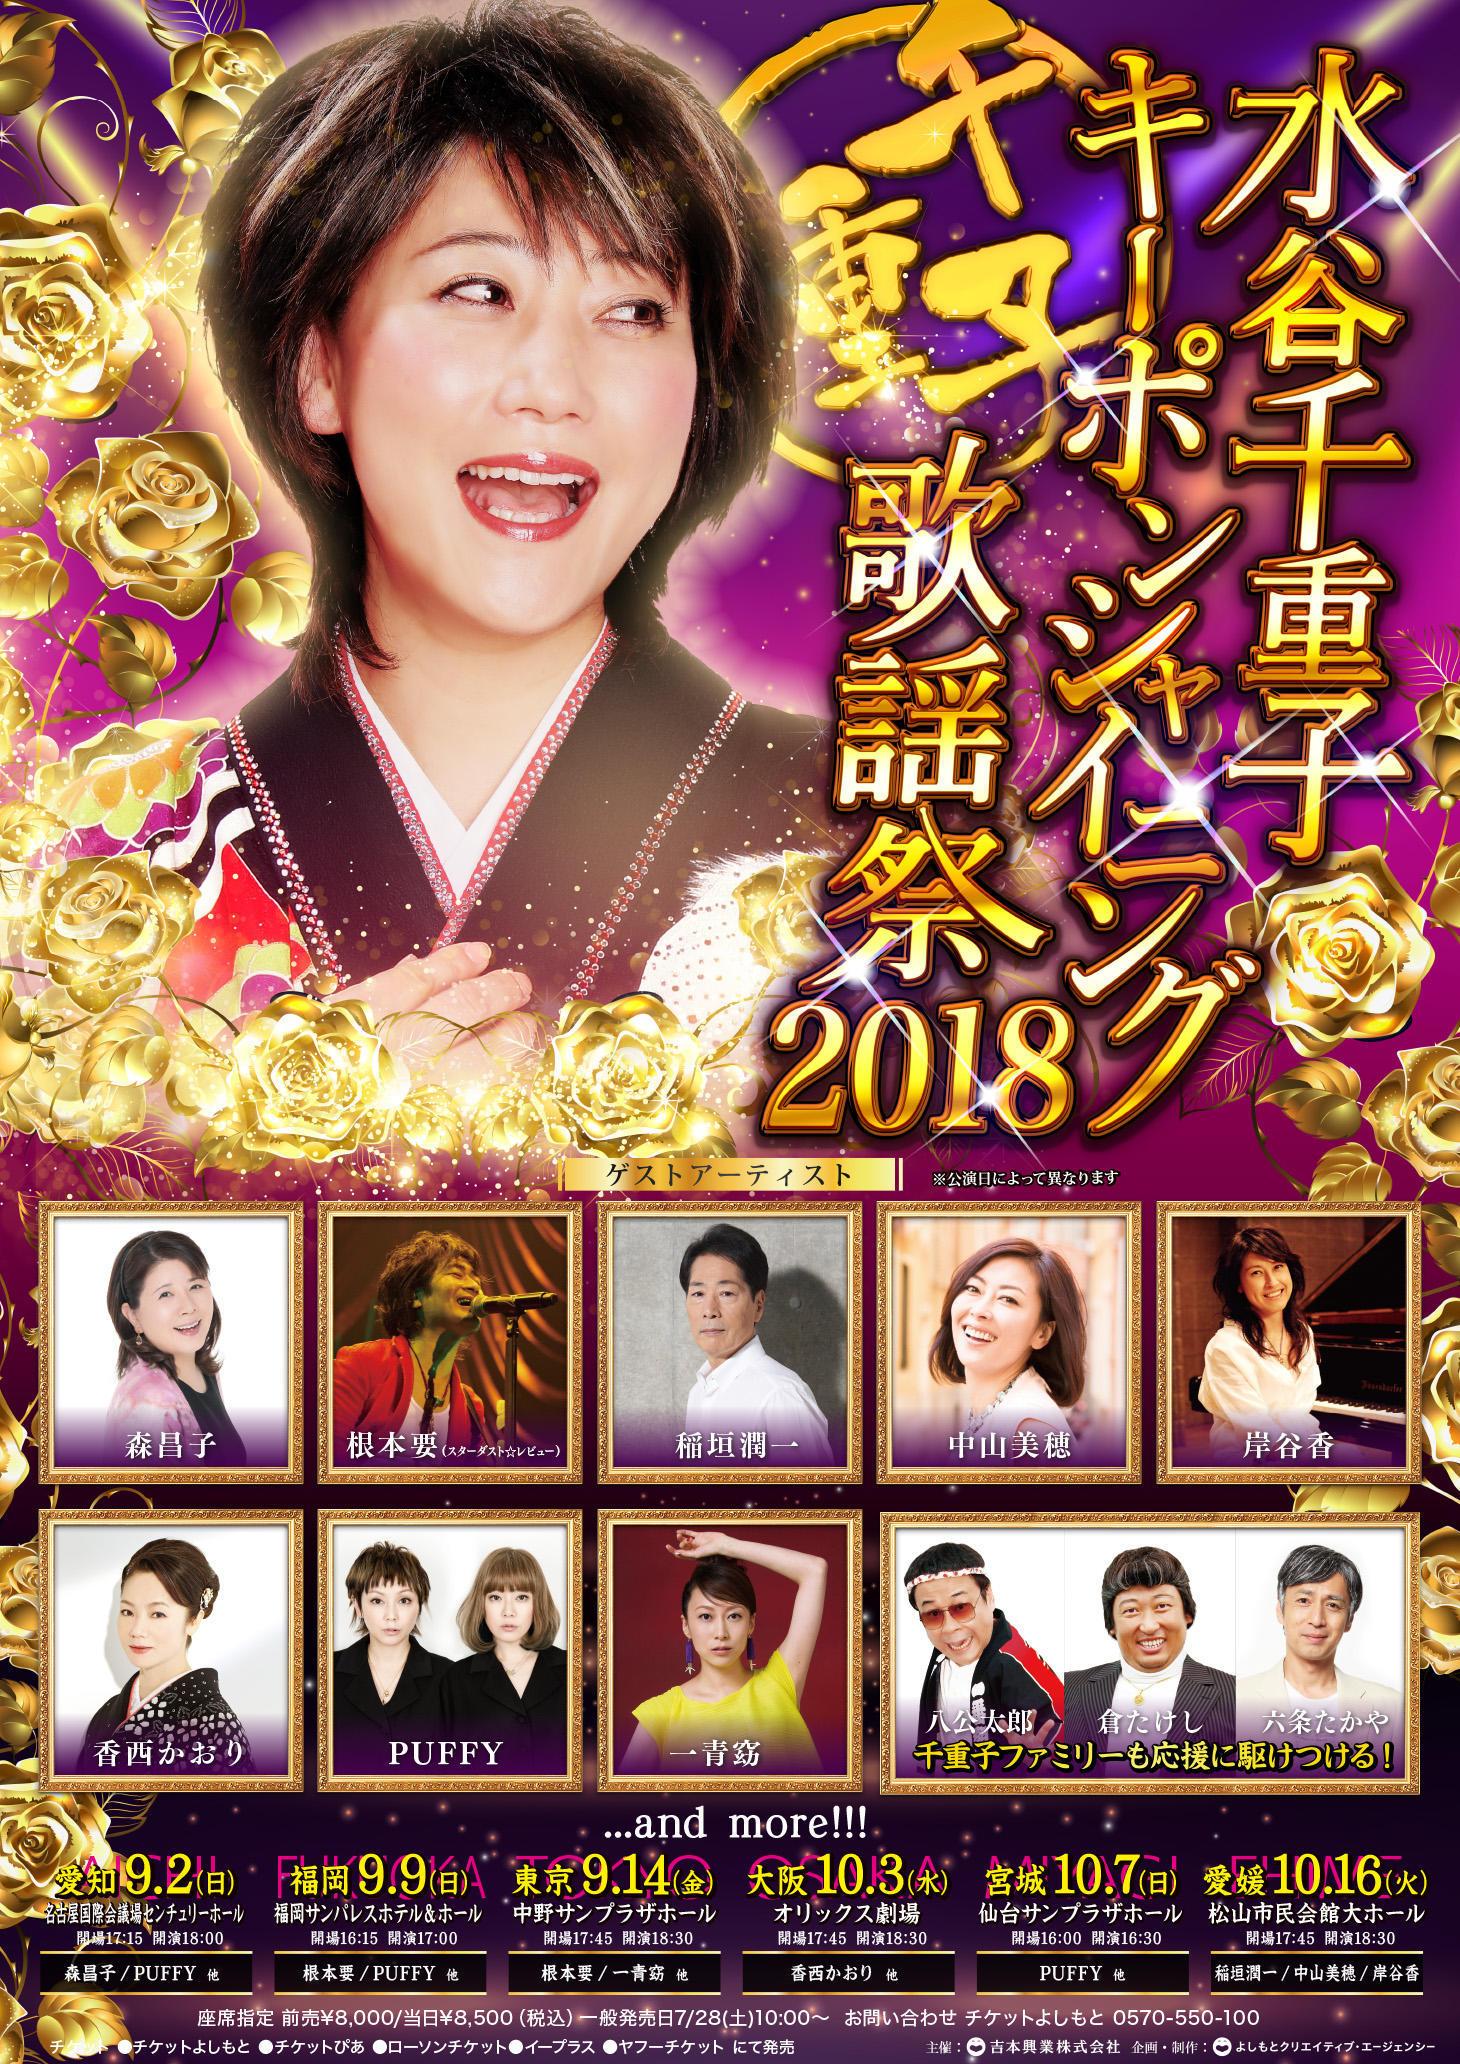 http://news.yoshimoto.co.jp/20180710111941-6e524061d9ac05e55842abd3a6c7df9bfd8102ae.jpg